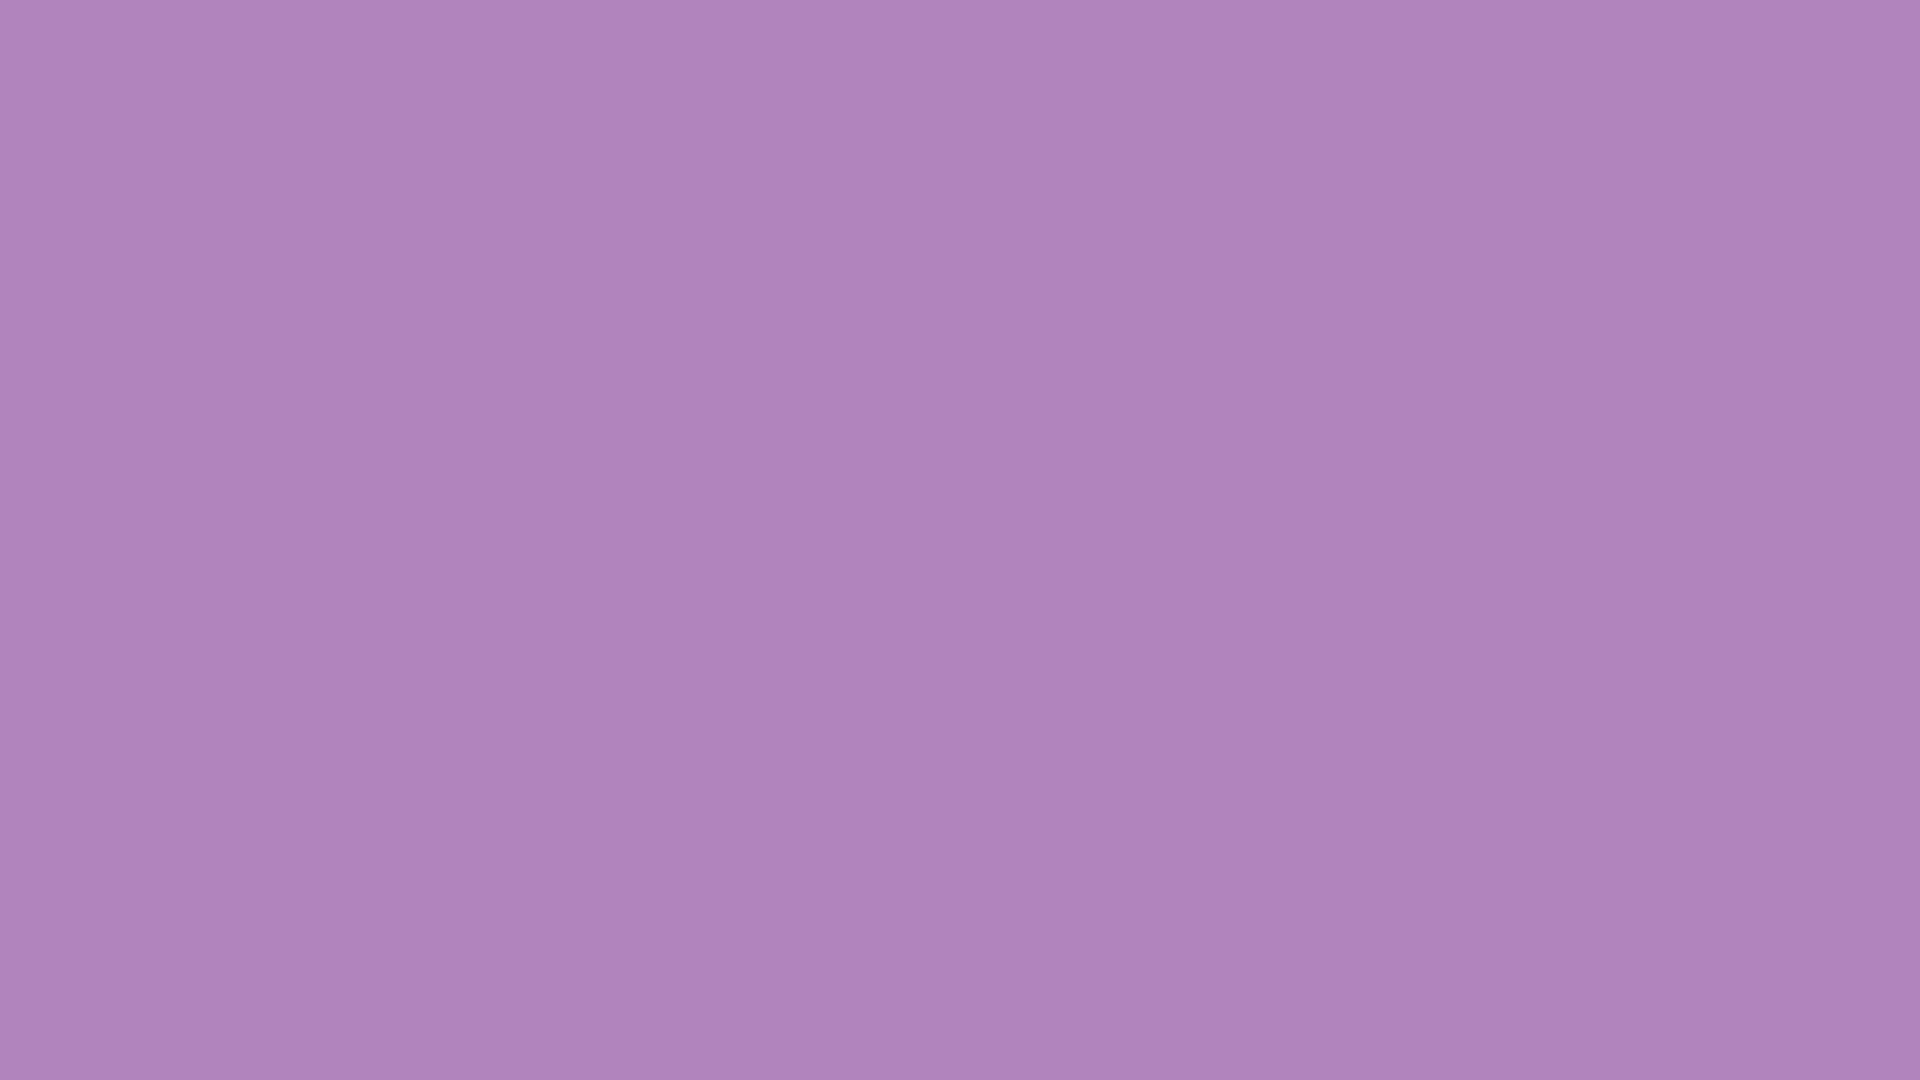 1920x1080 African Violet Solid Color Background